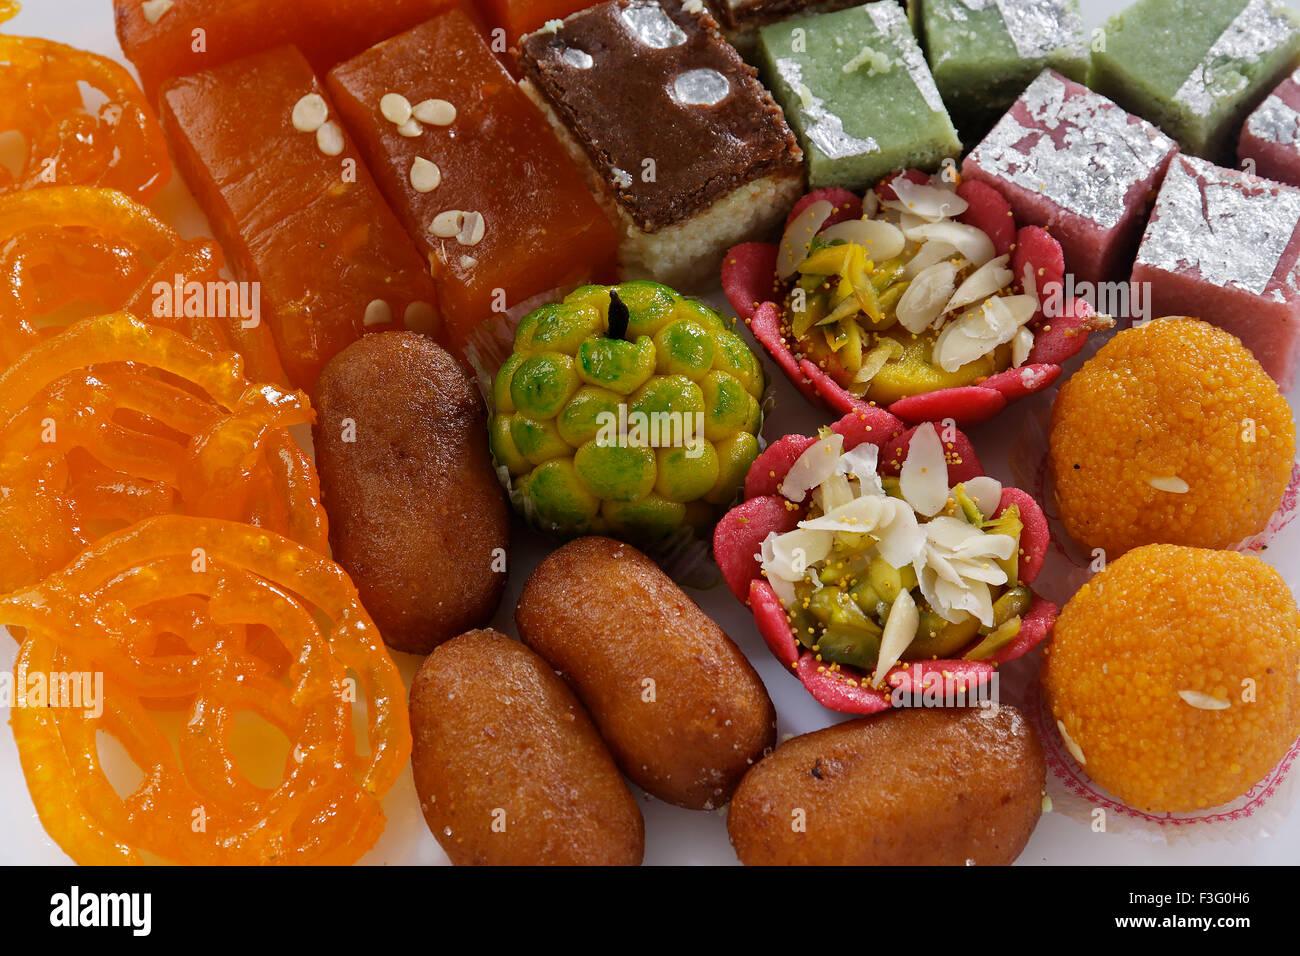 Indian sweet ; mithai ; India Stock Photo: 88247522 - Alamy